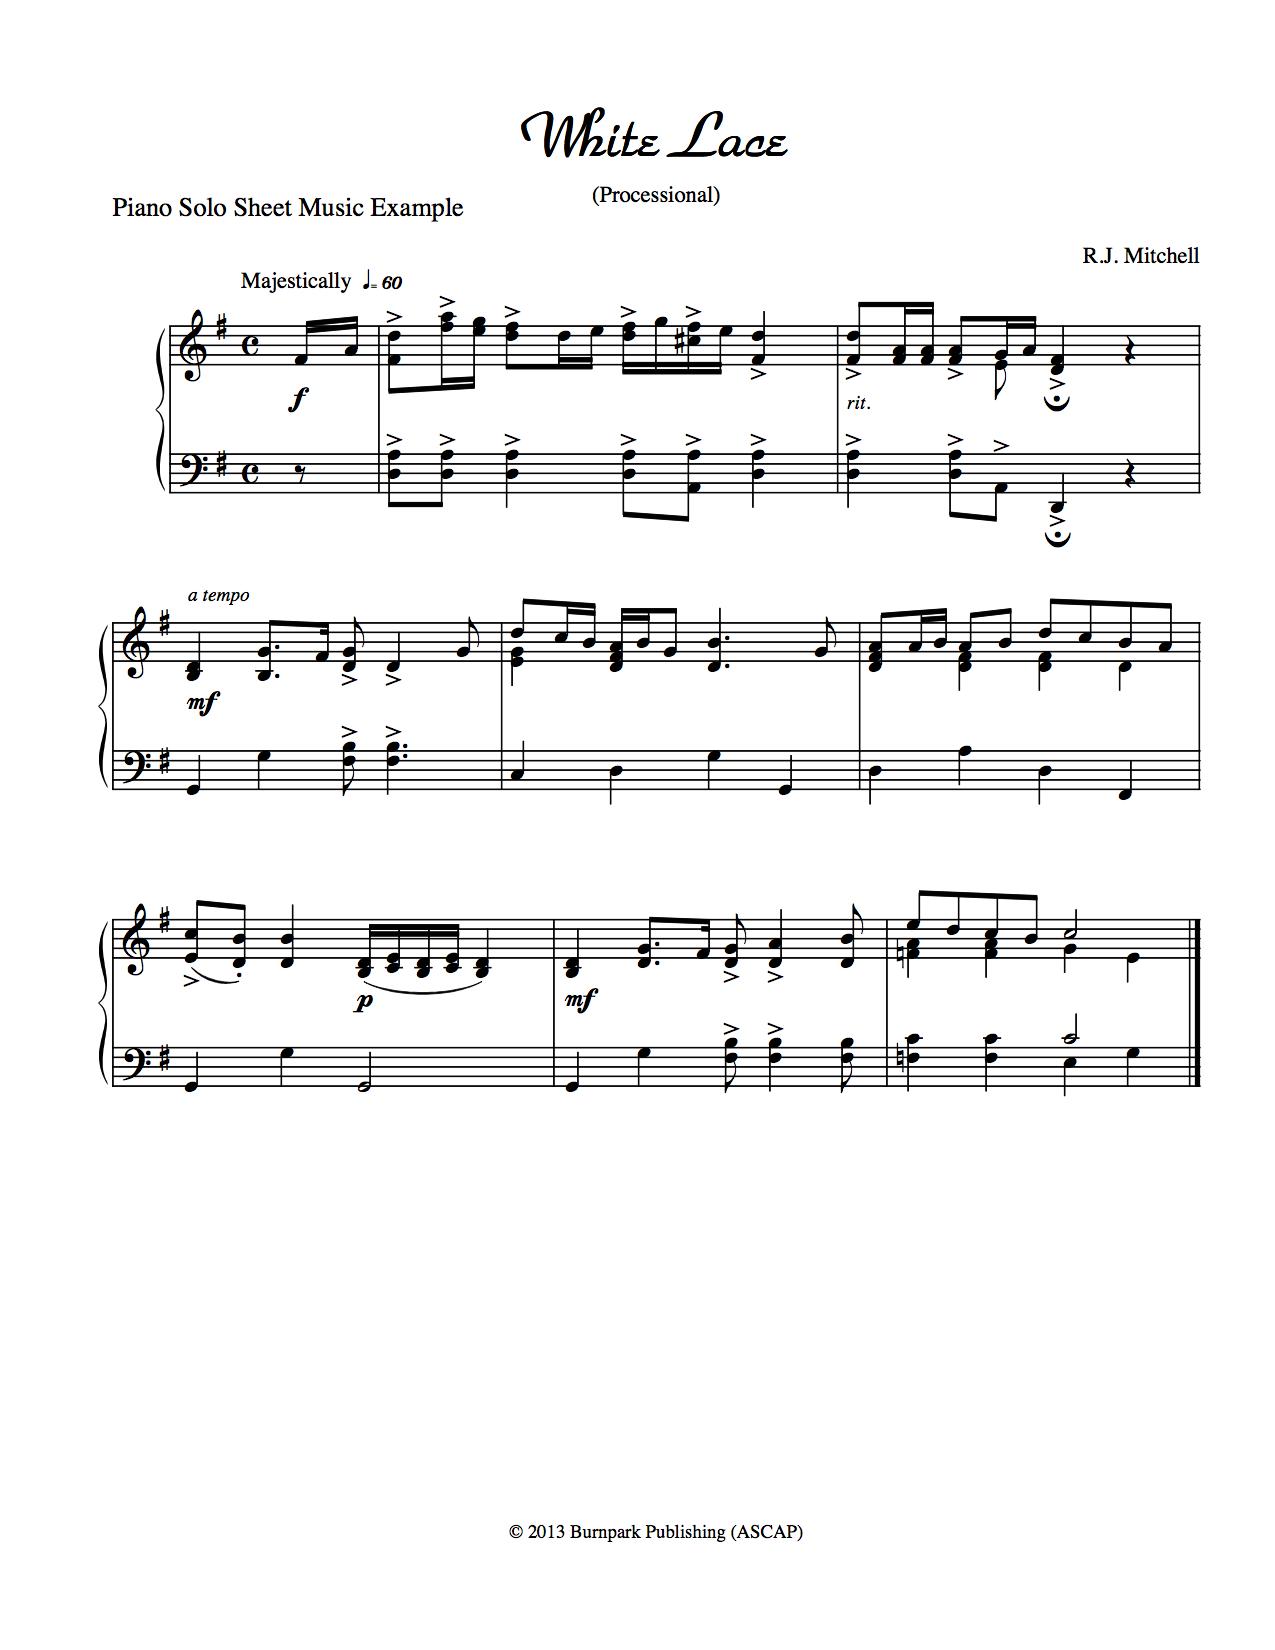 Piano Sheet Music Example